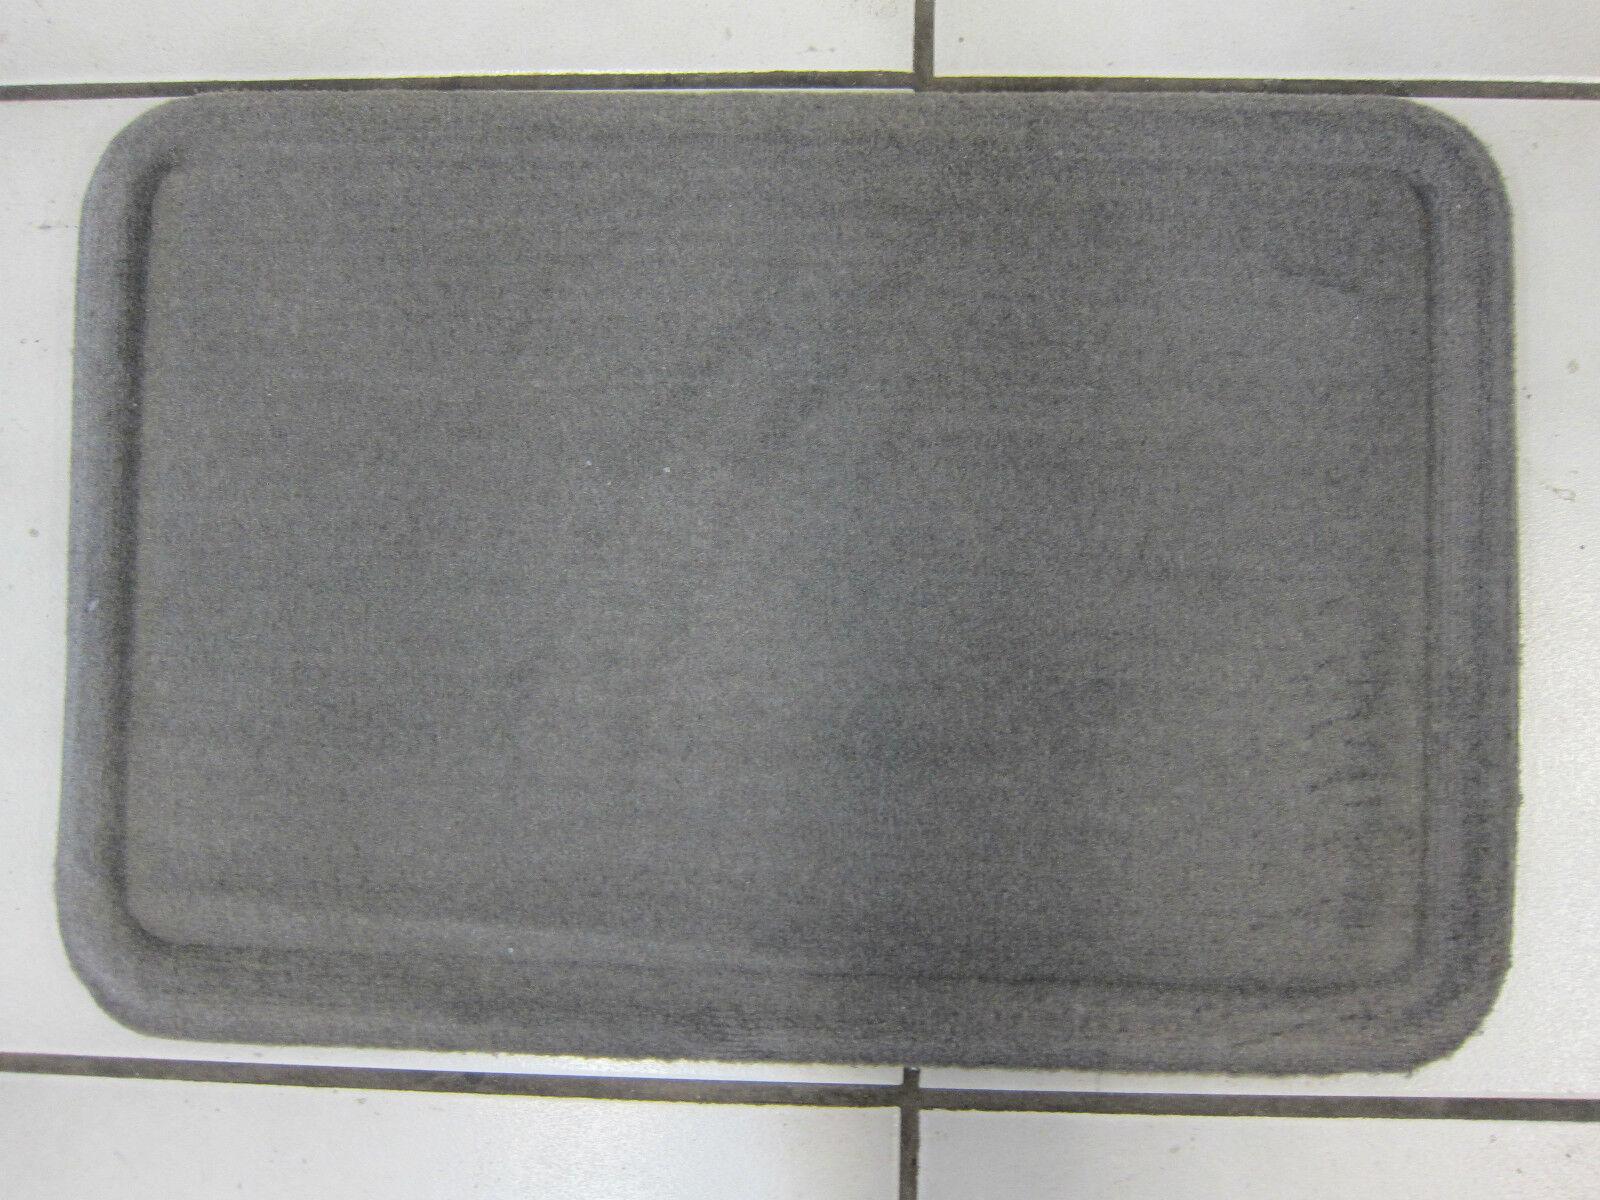 1999 2004 Jeep Grand Cherokee Taupe Carpet Floor Mats